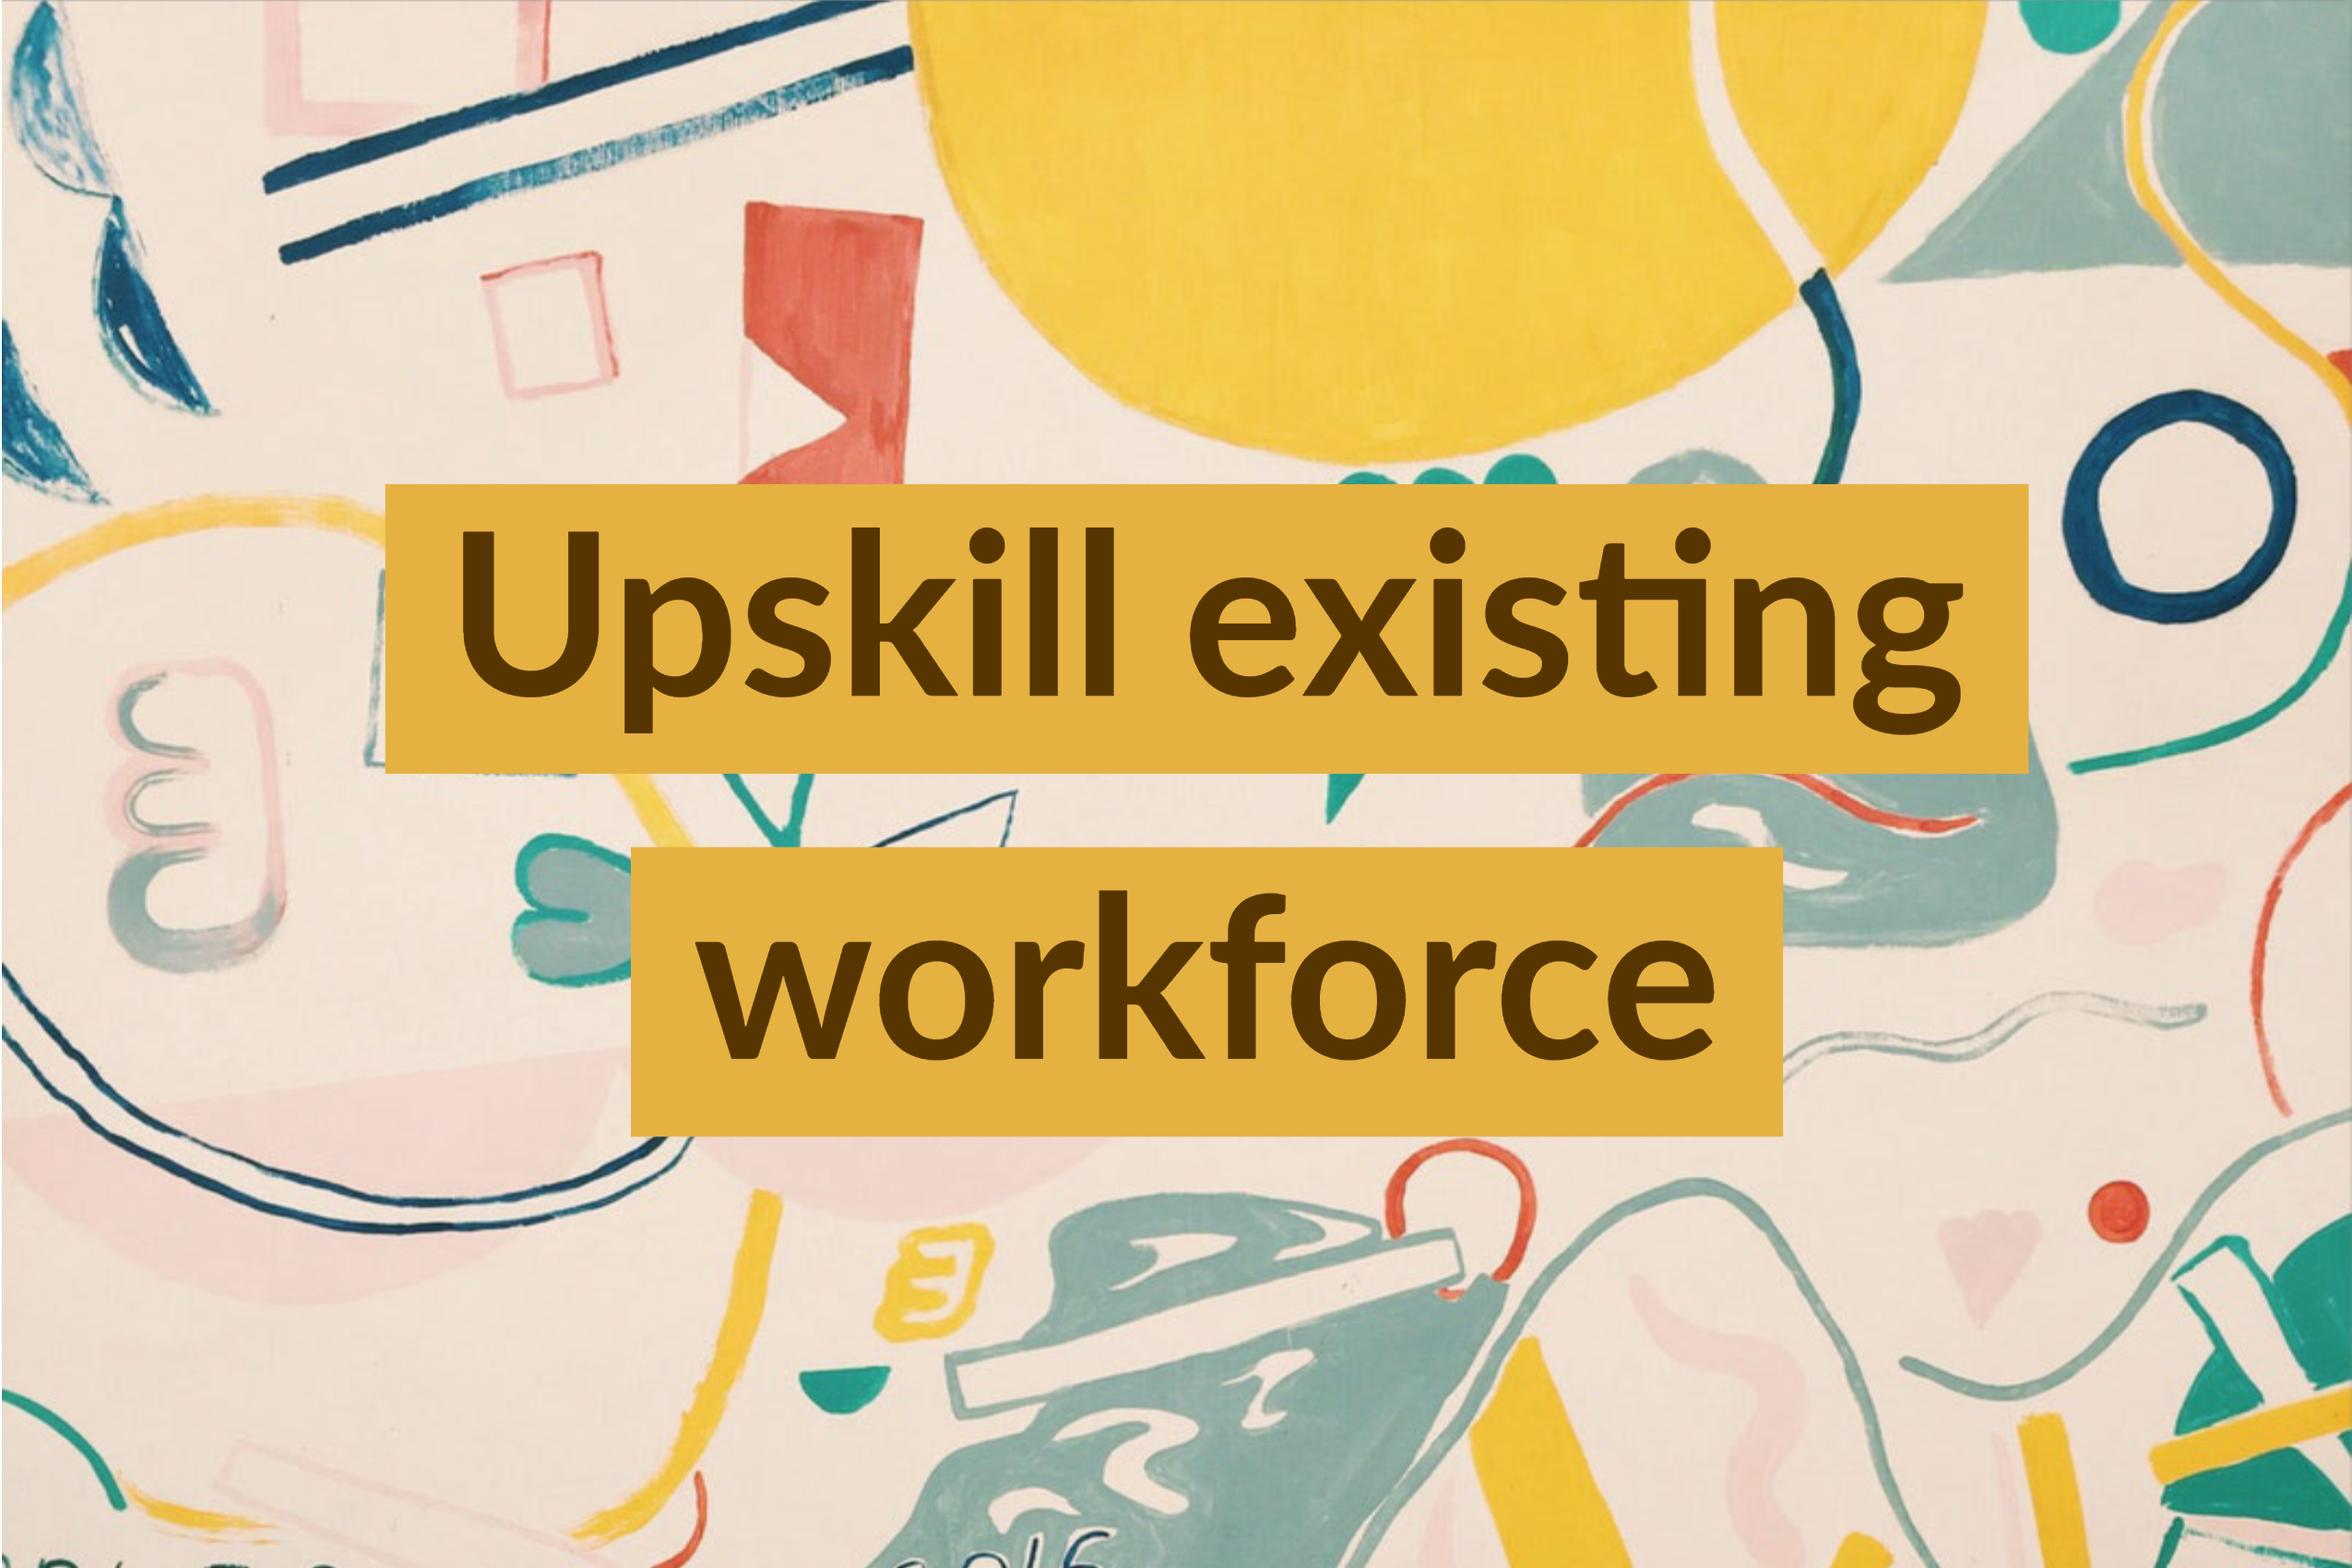 Upskill existing workforce